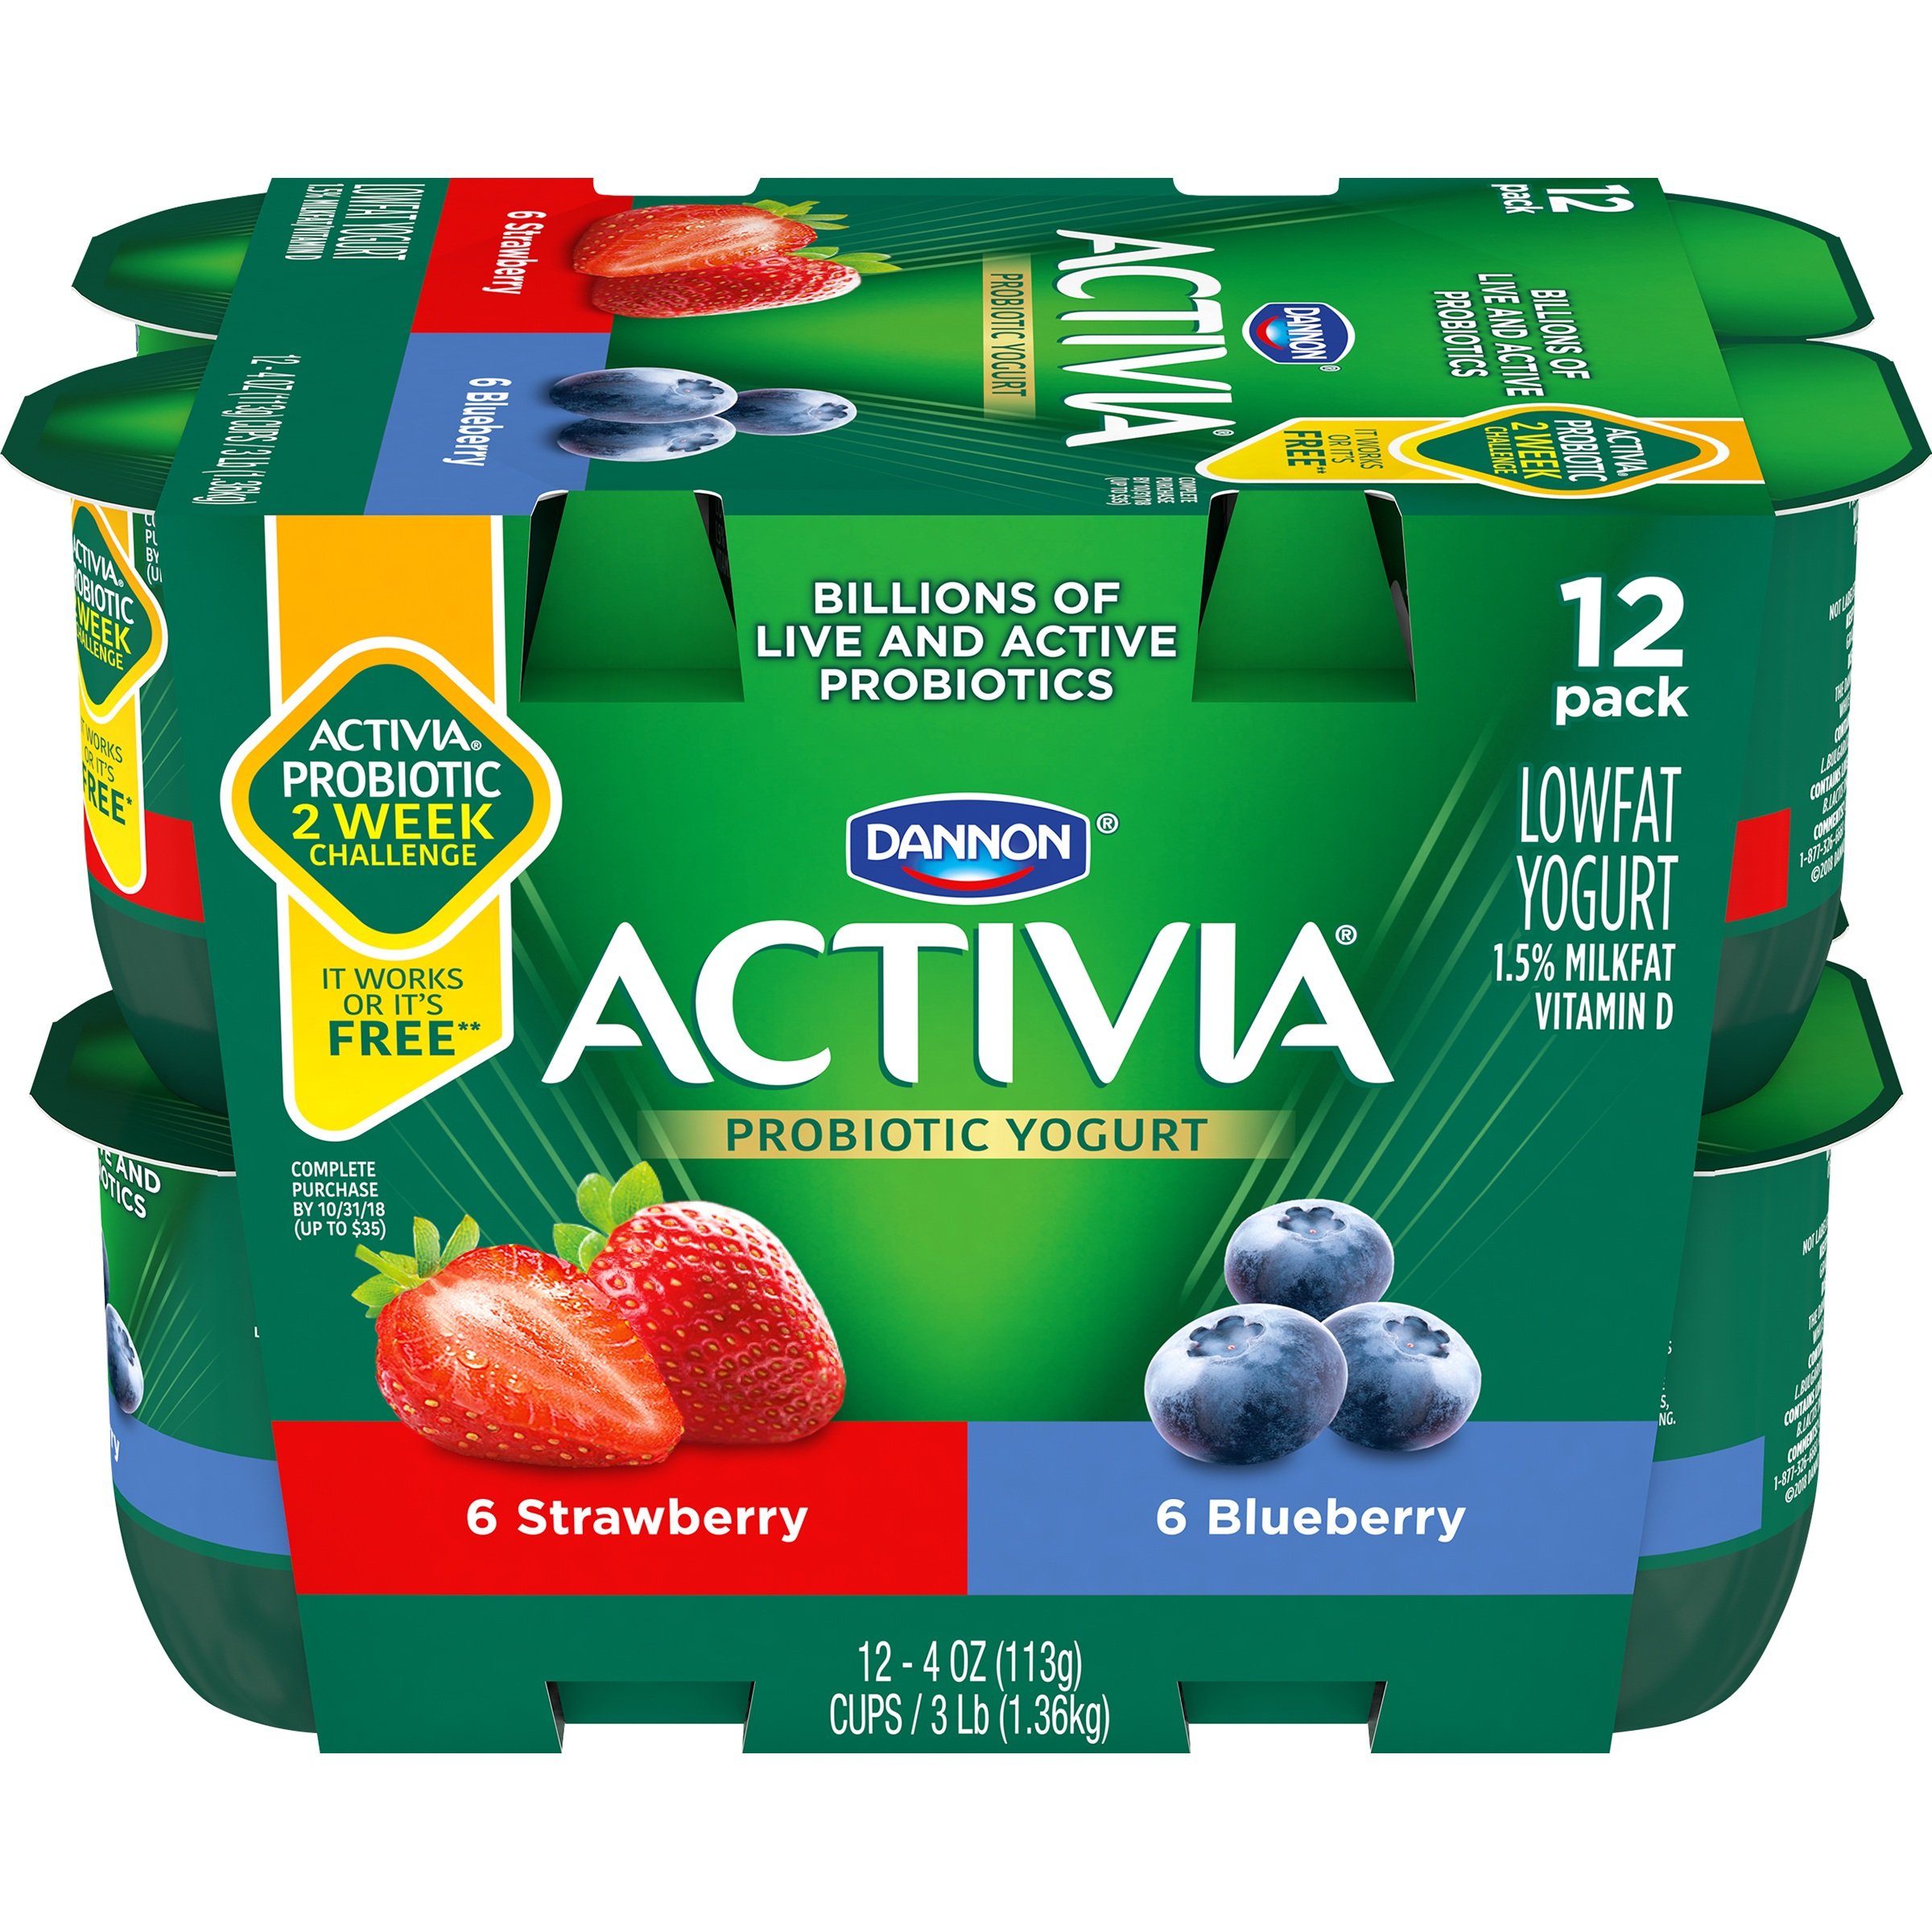 Activia Lowfat Yogurt Nutrition Information | Besto Blog